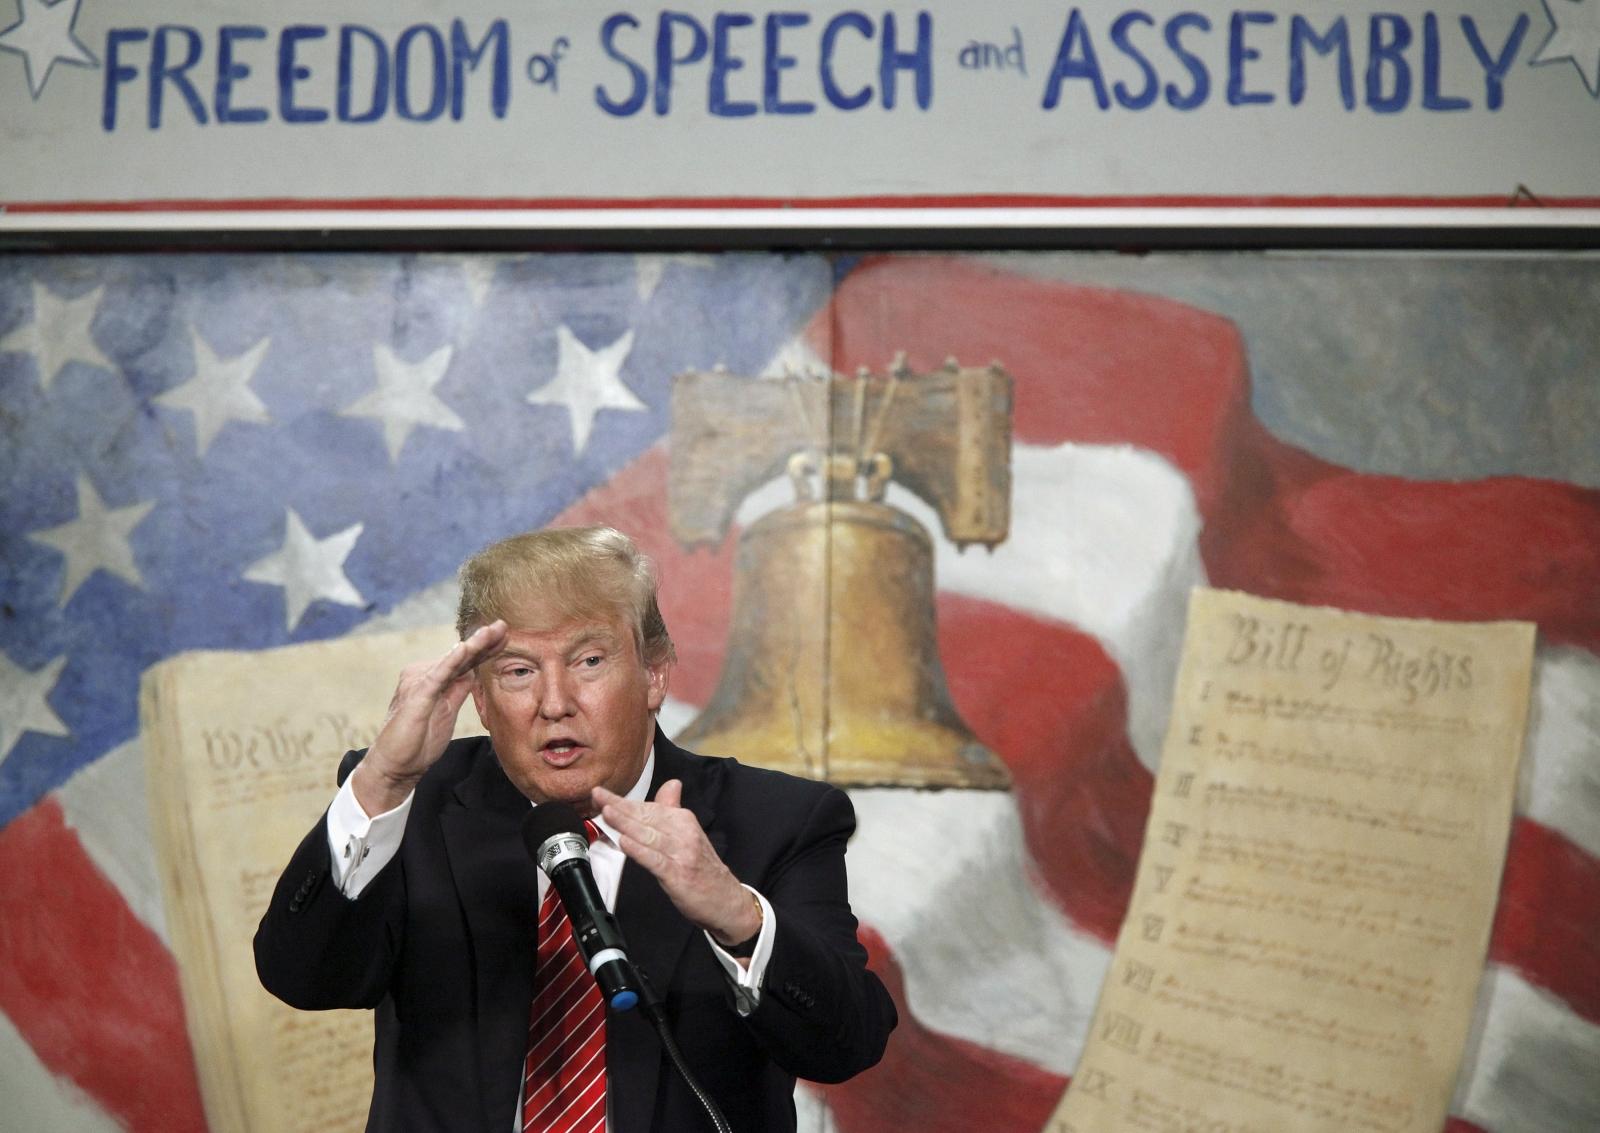 American Companies Resist Trump's 'Muslim Ban'